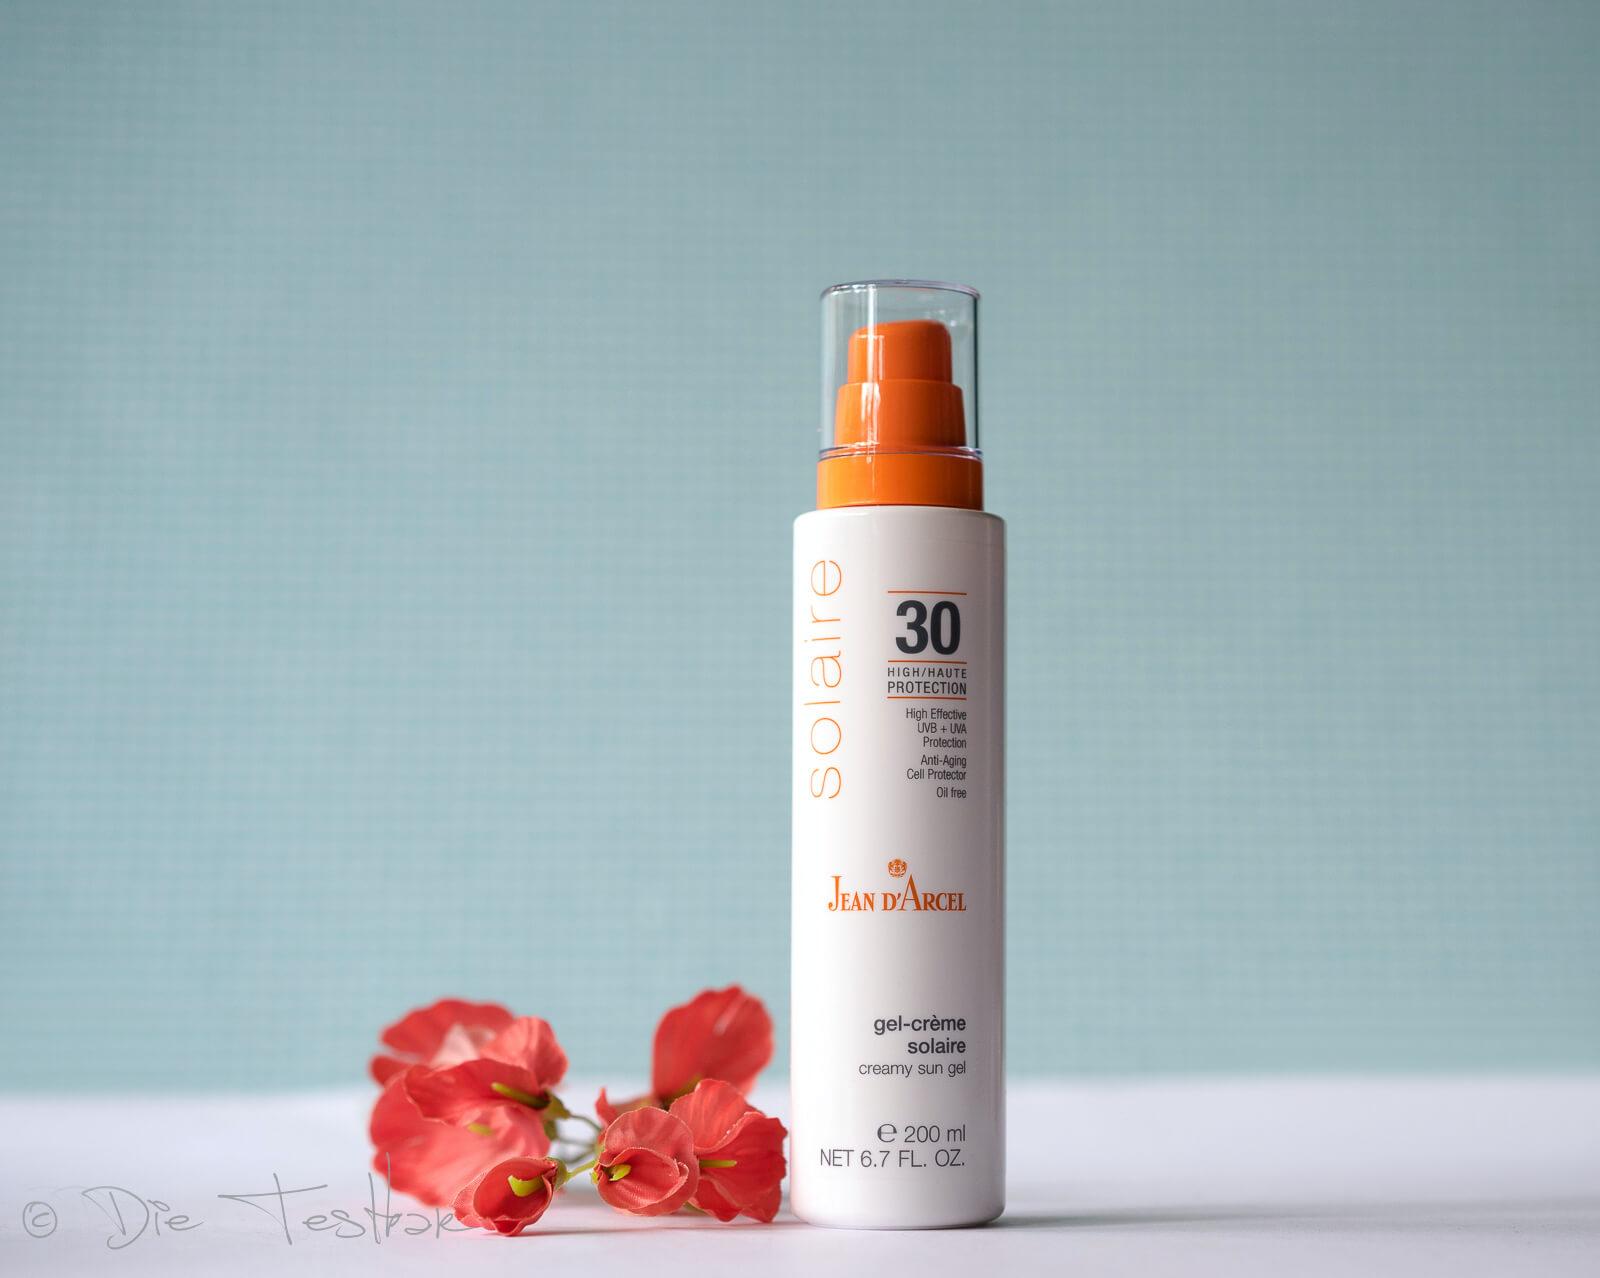 gel-crème solaire LSF 30 creamy sun gel